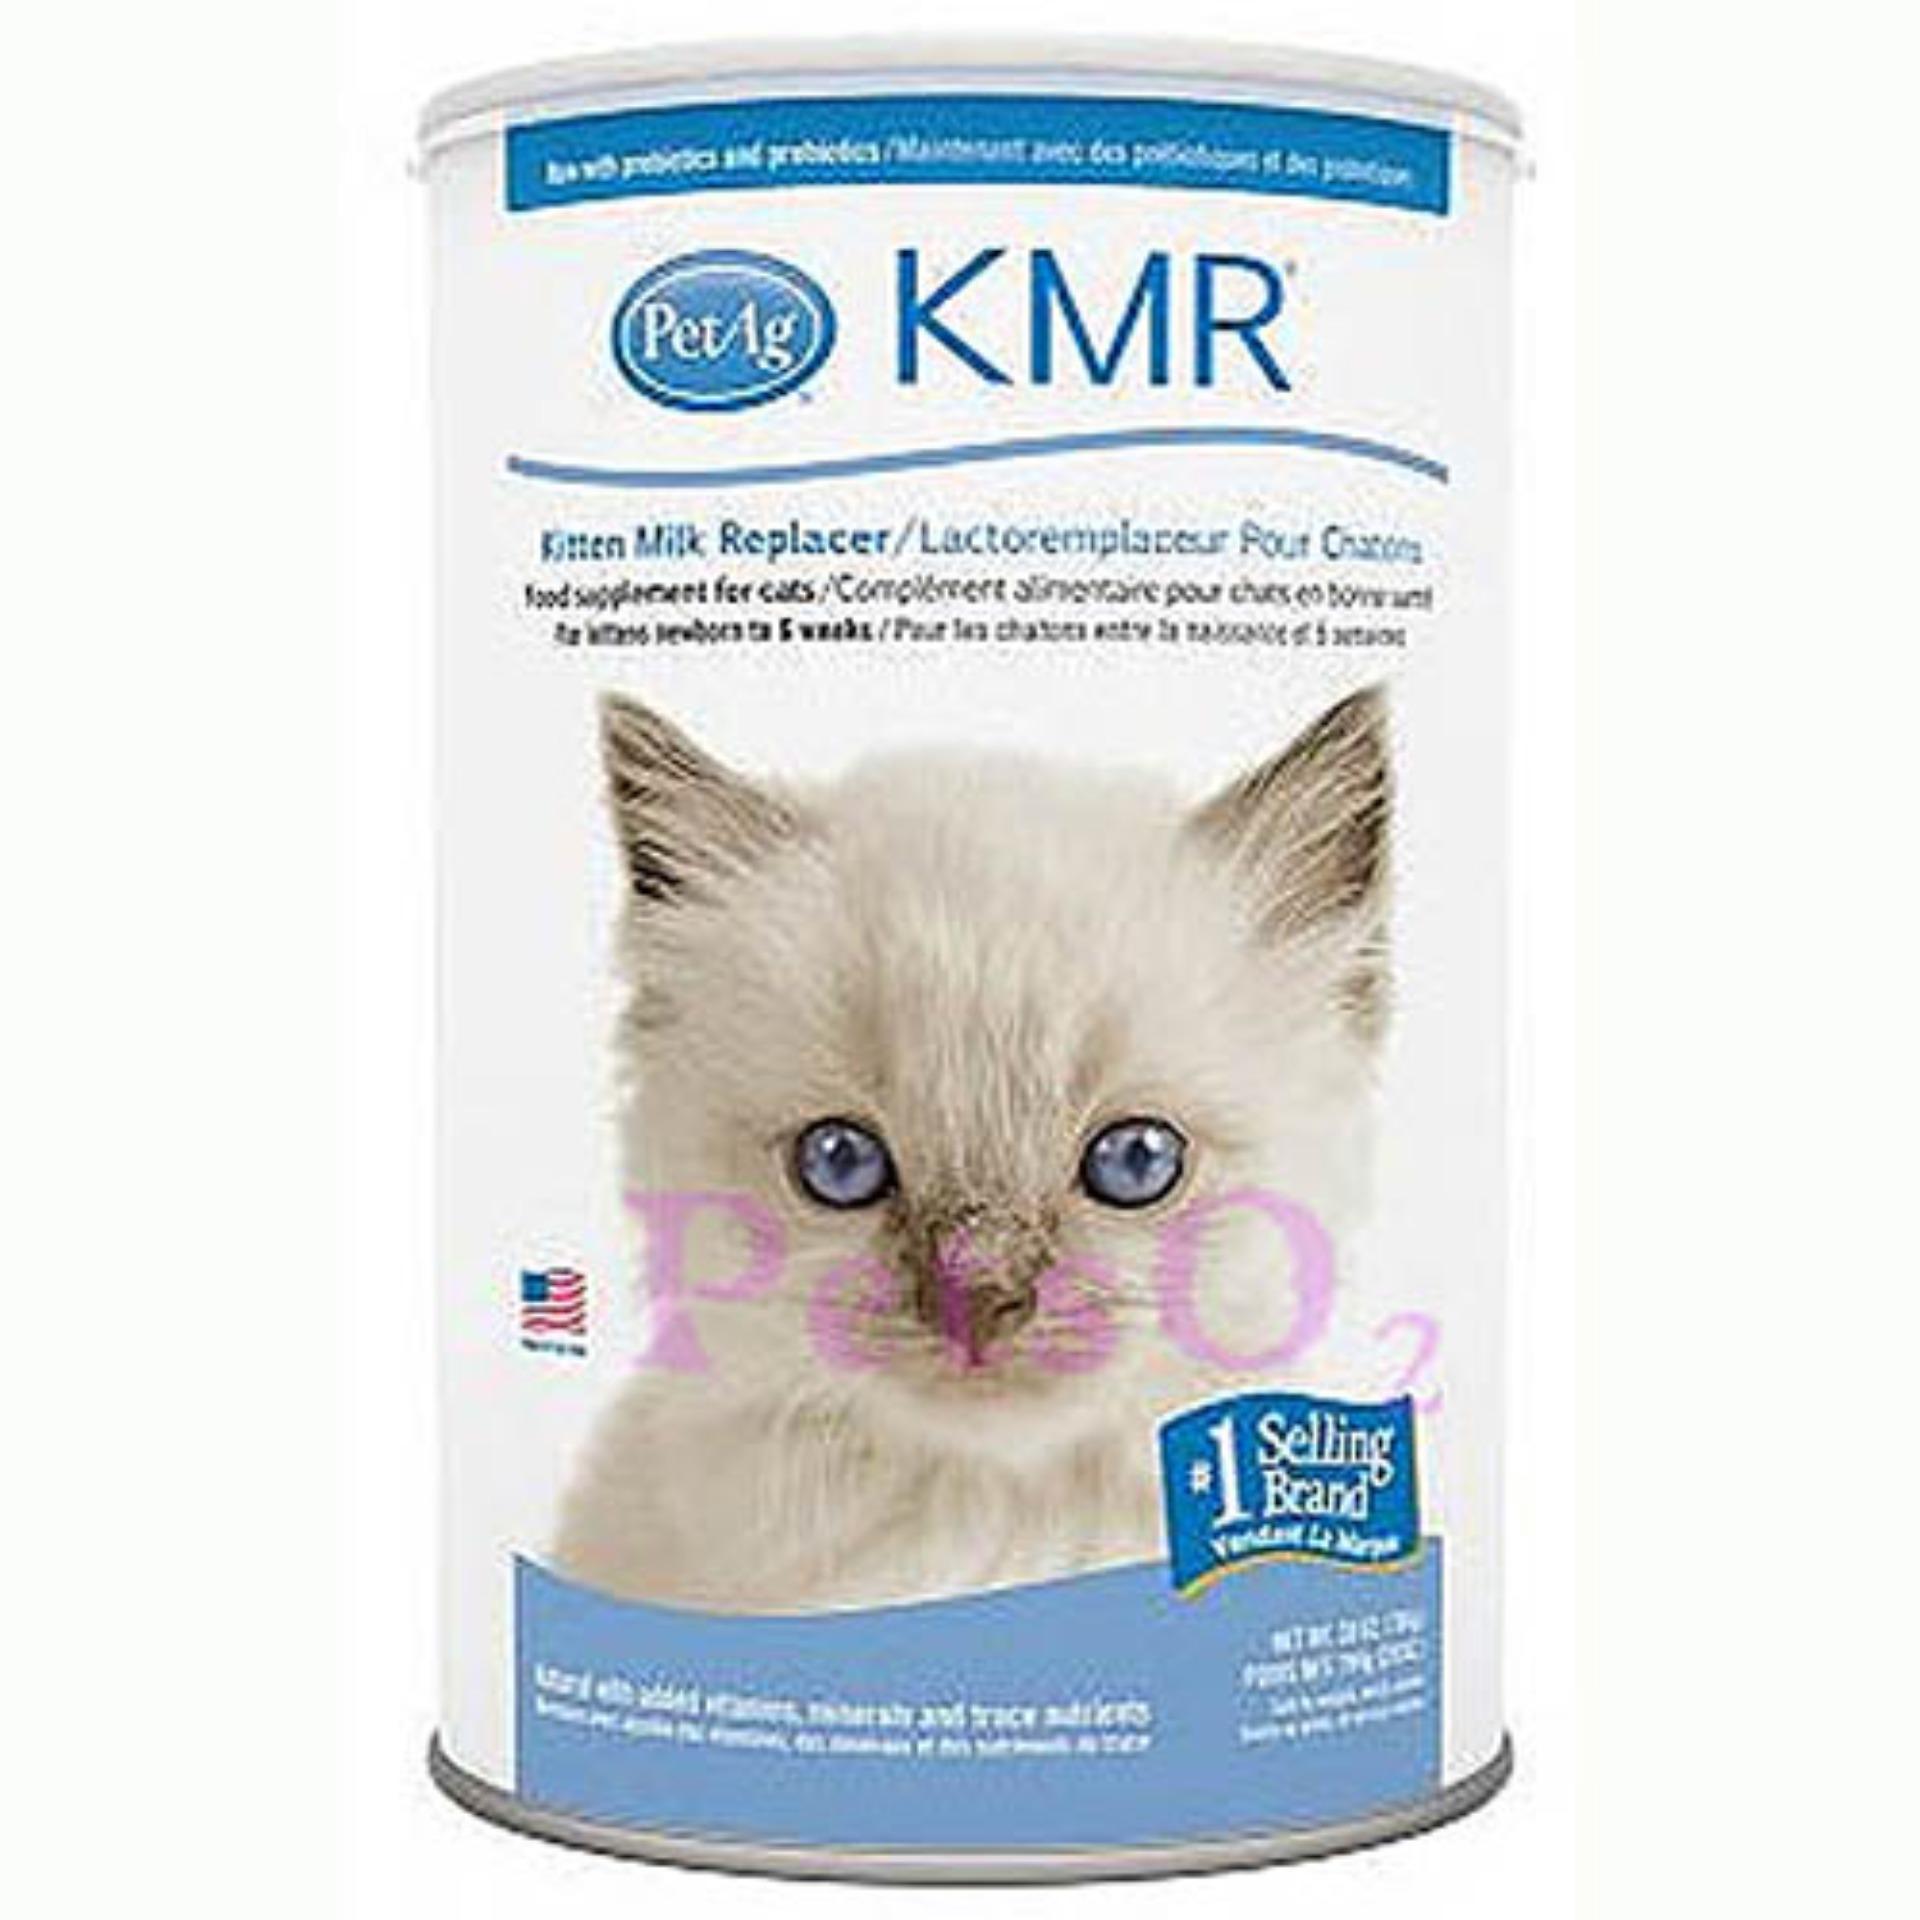 Petag Kitten Milk Replacement Powder 6Oz Lowest Price